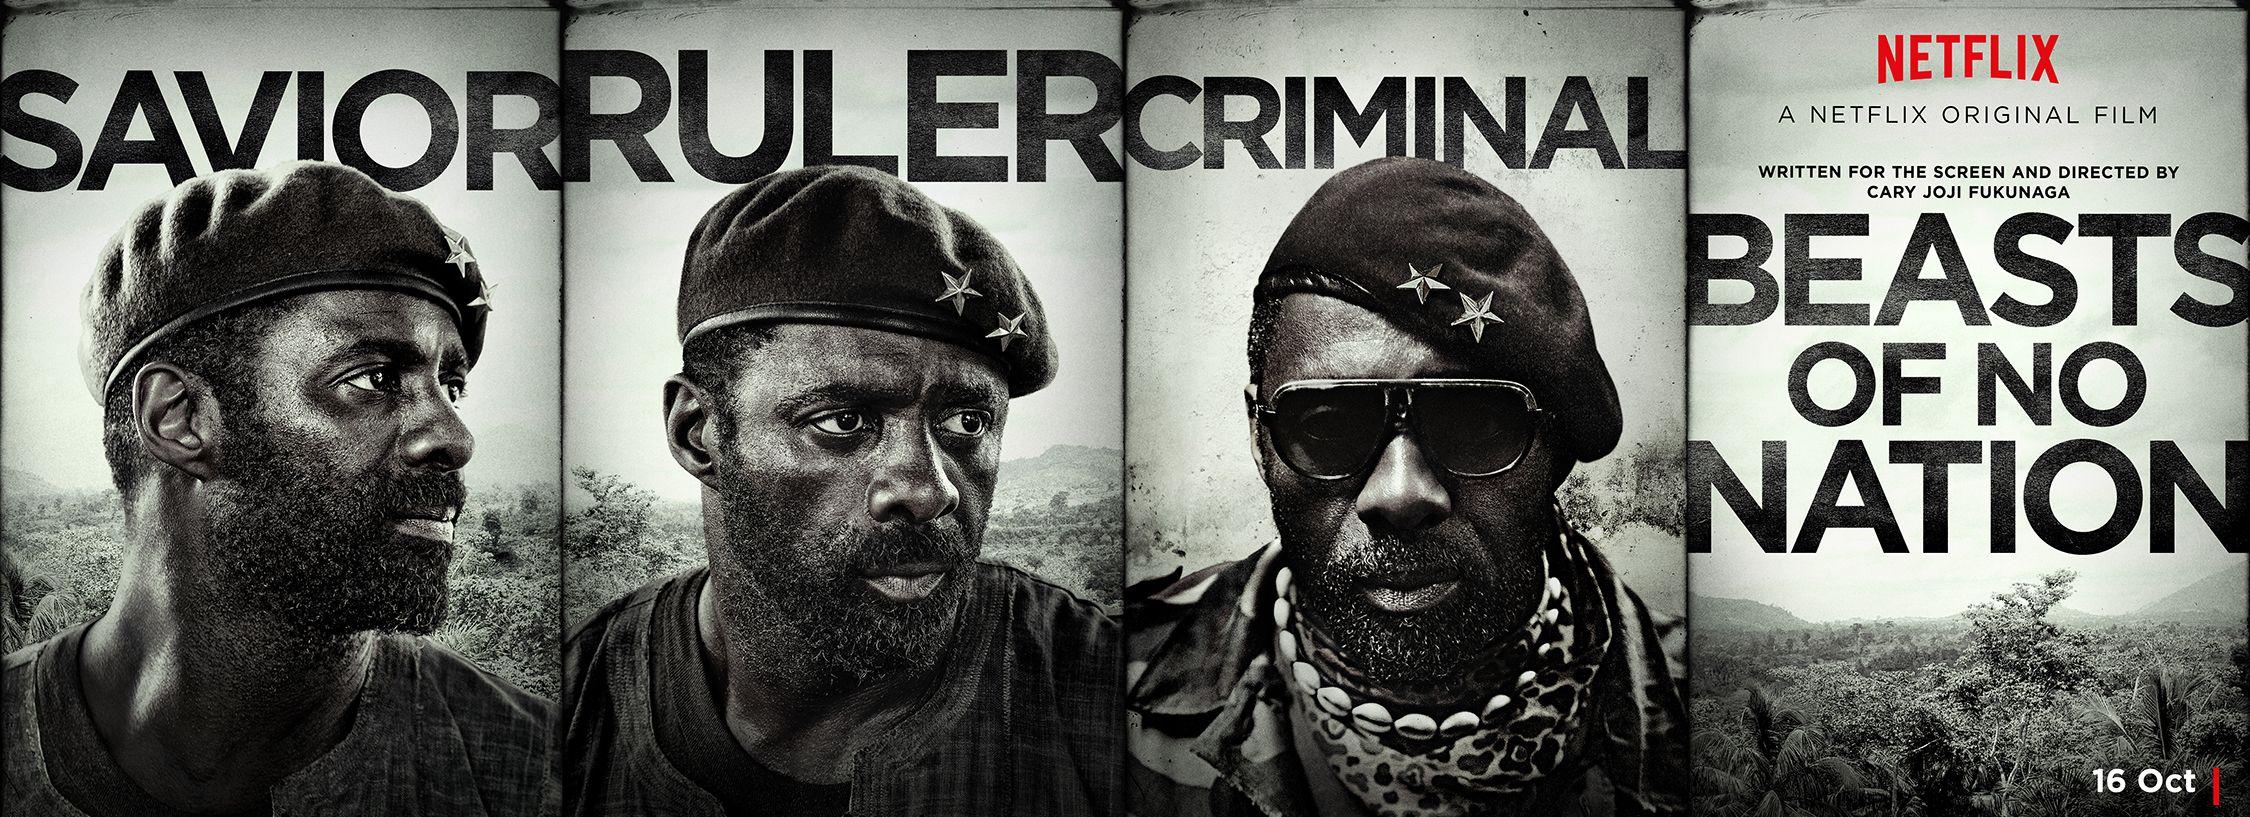 New Banner for Idris Elba's 'Beasts of No Nation' - Savior,